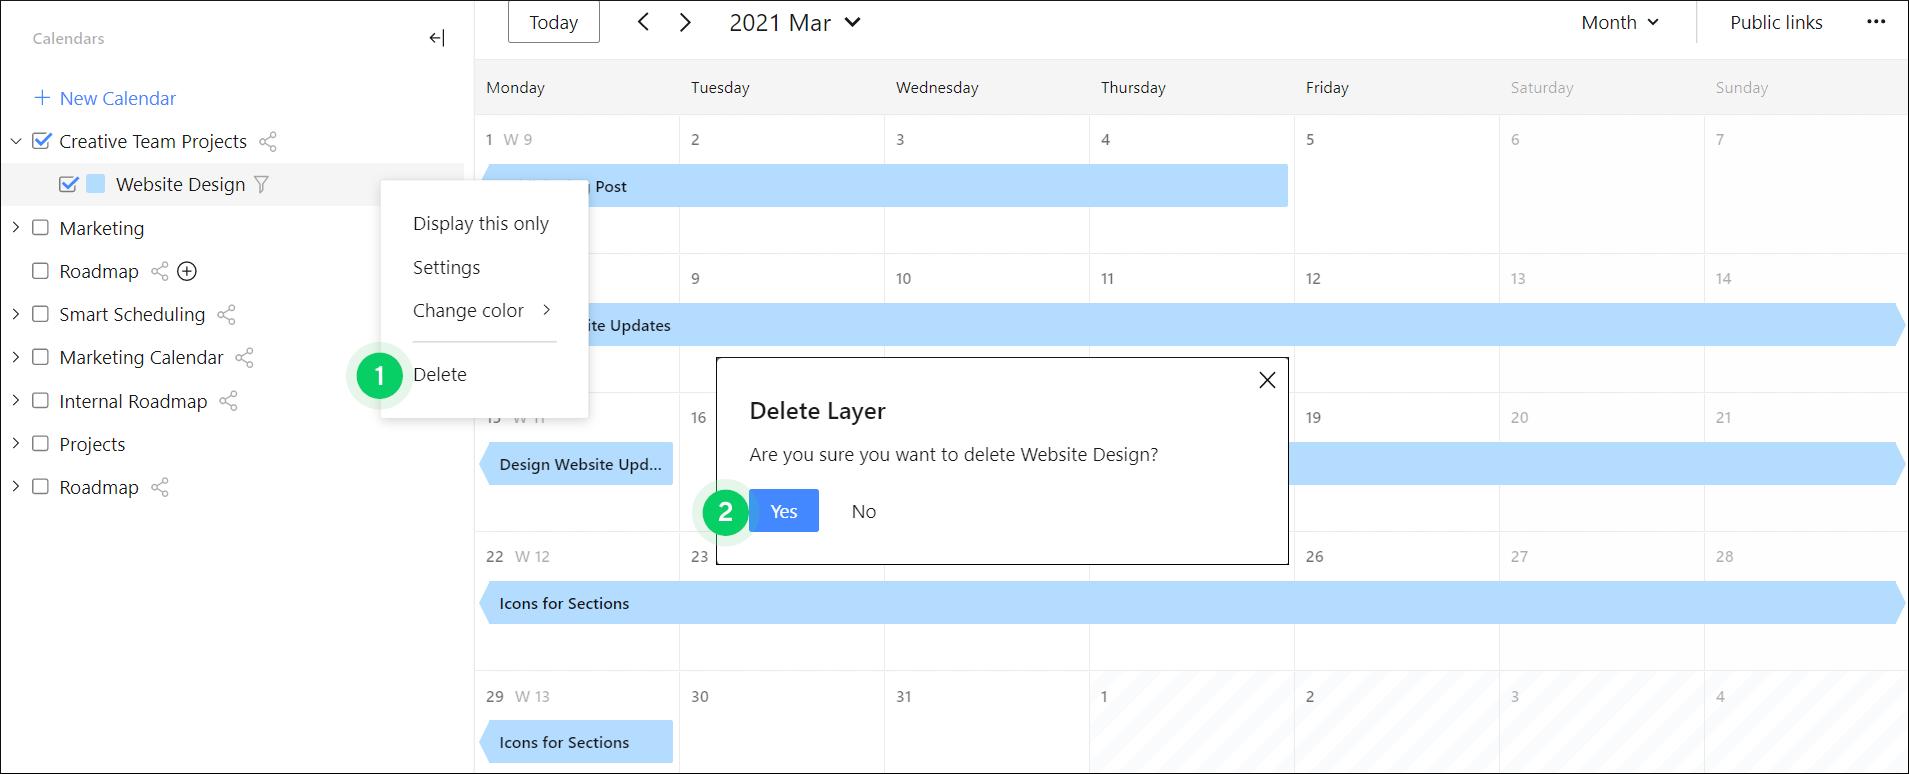 Calendars_-_Delete_calendar_or_layer.png